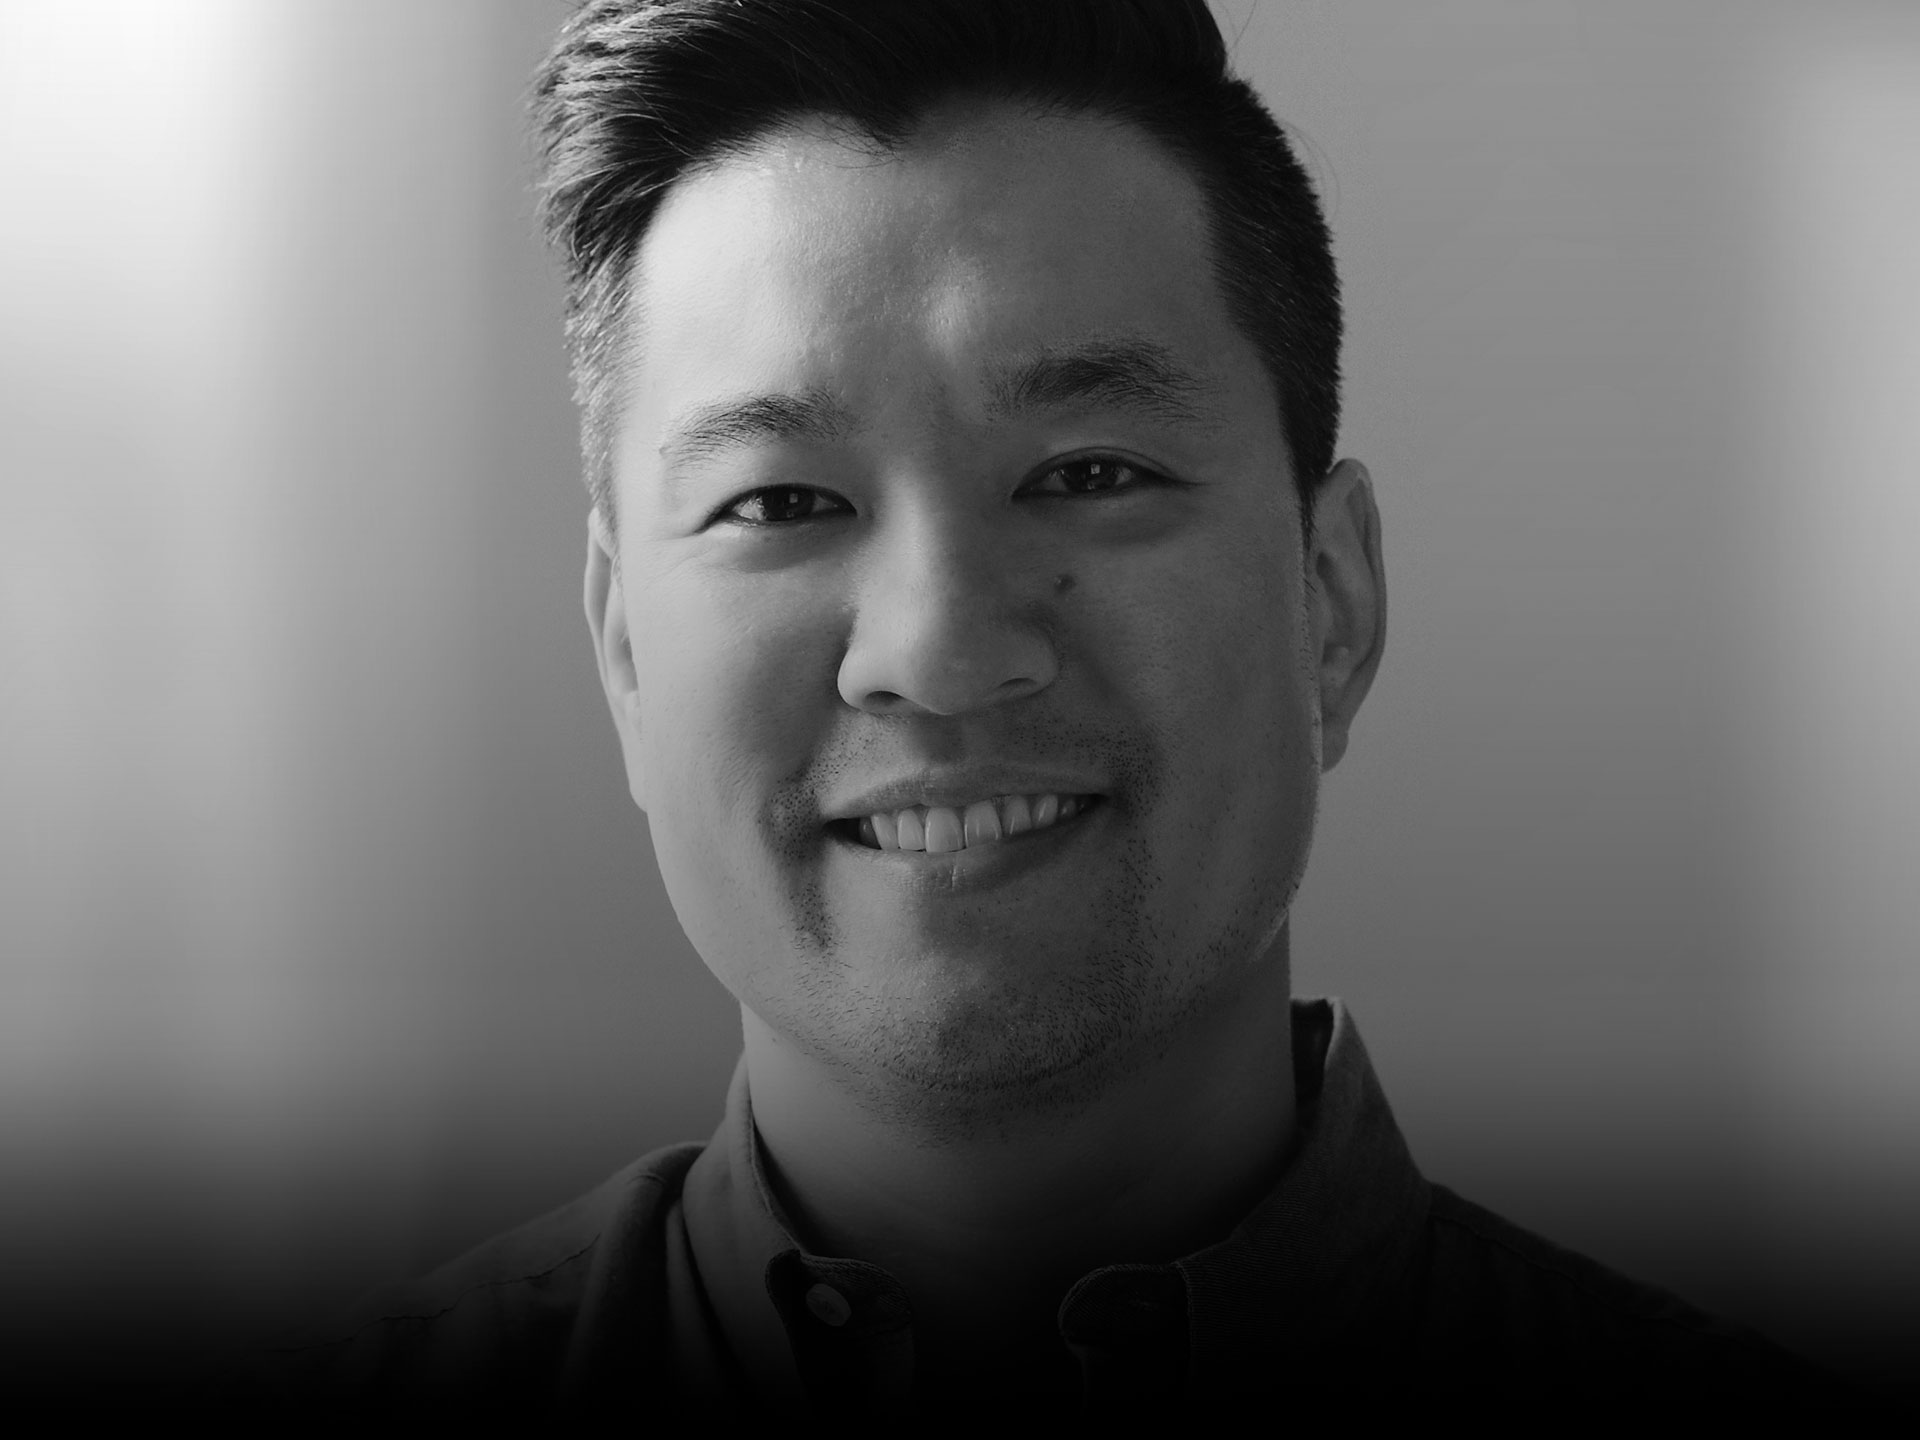 Image of Rudy Chung